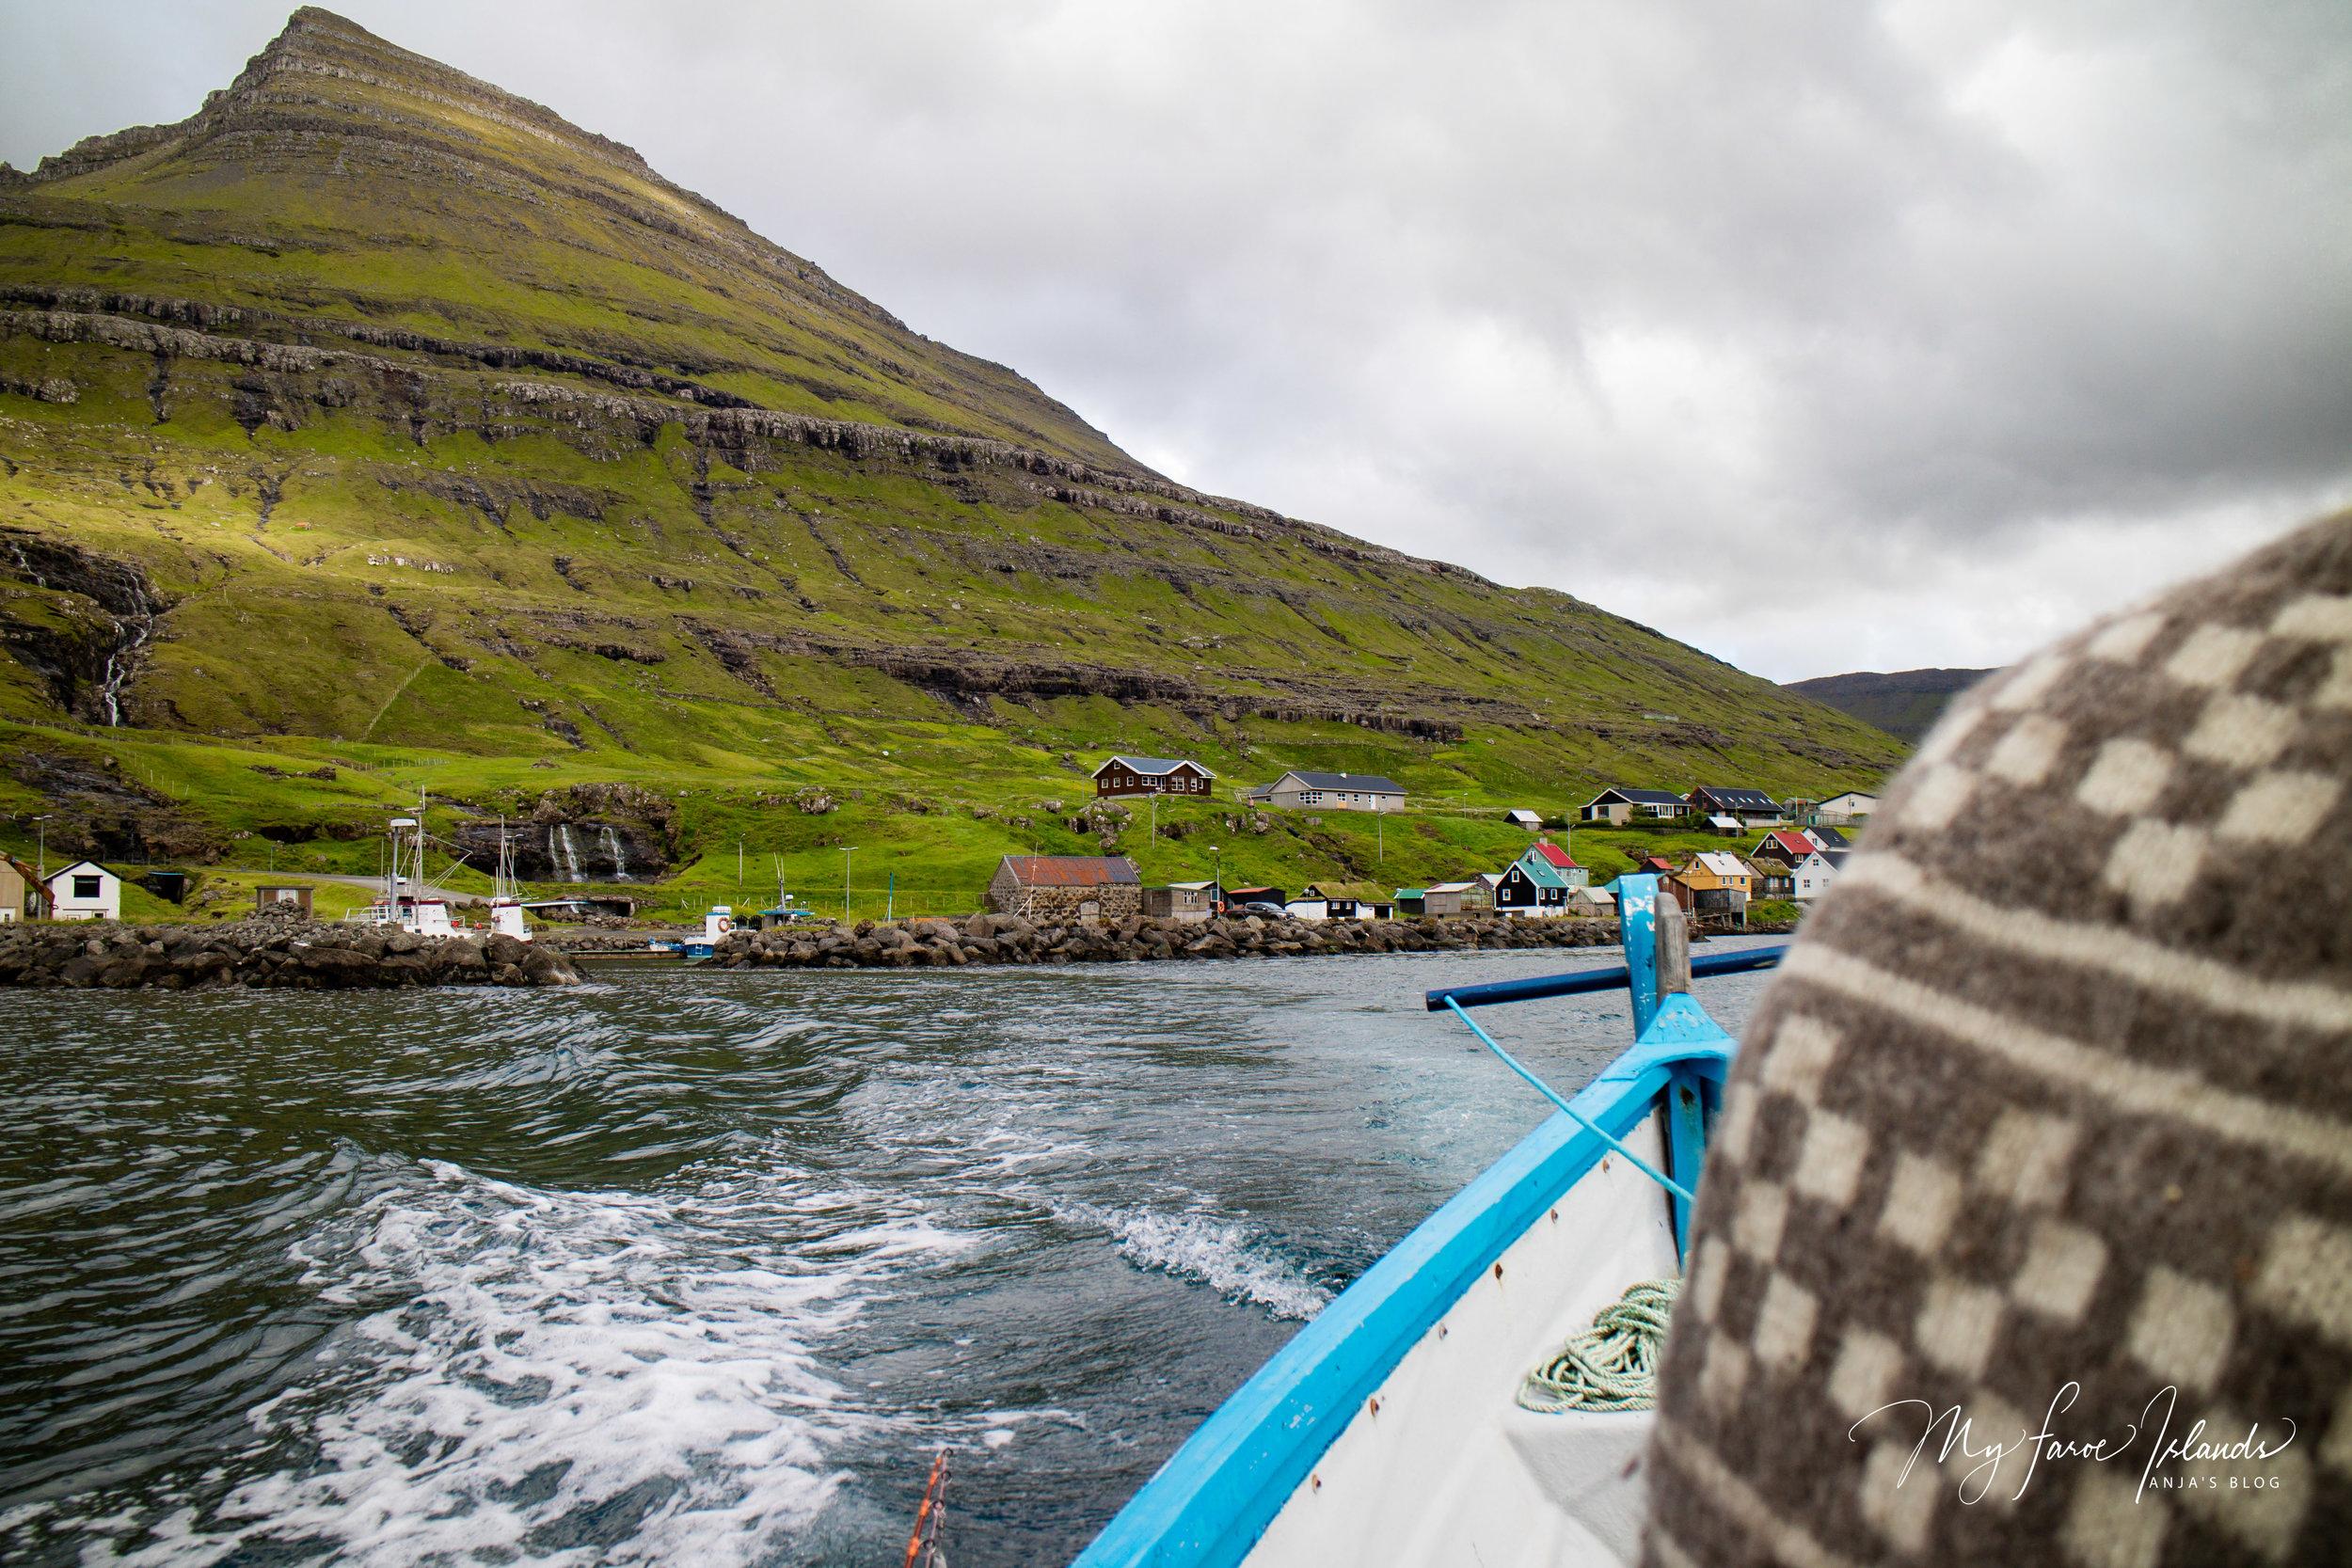 Leaving Harbor new © My Faroe Islands, Anja Mazuhn  (1 von 1).jpg